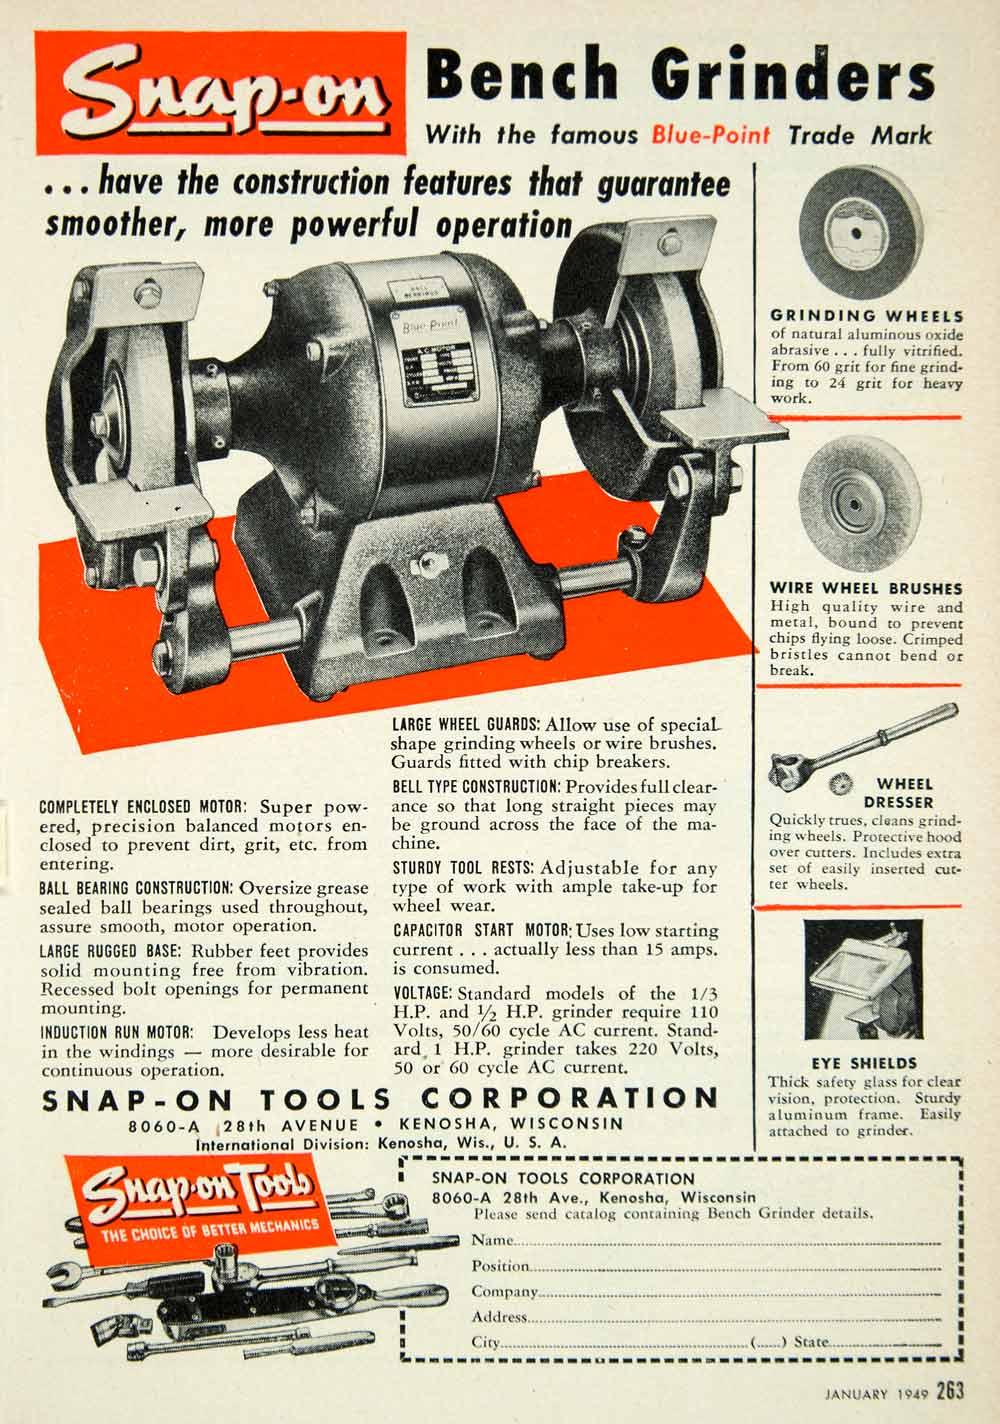 1949 ad snap on tools bench grinder 28th avenue kenosha